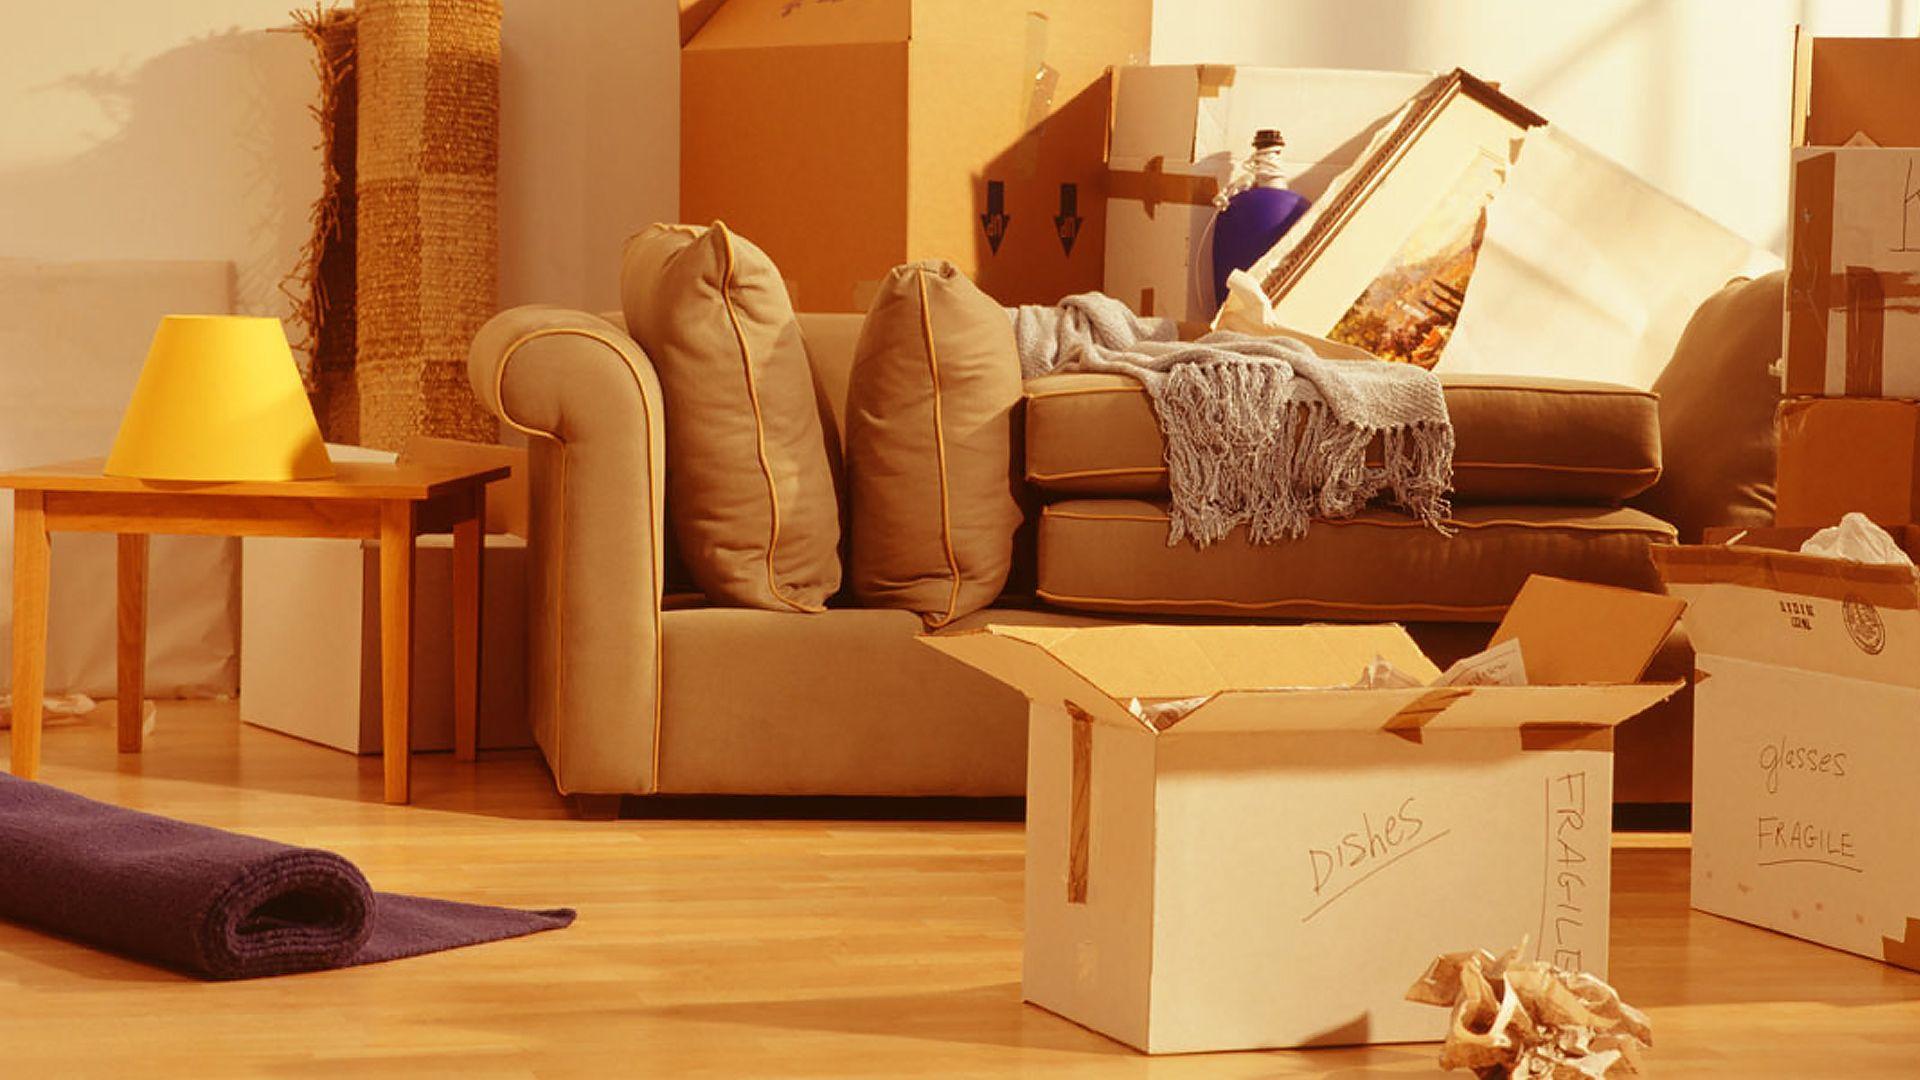 residential mover services in Atlanta GA